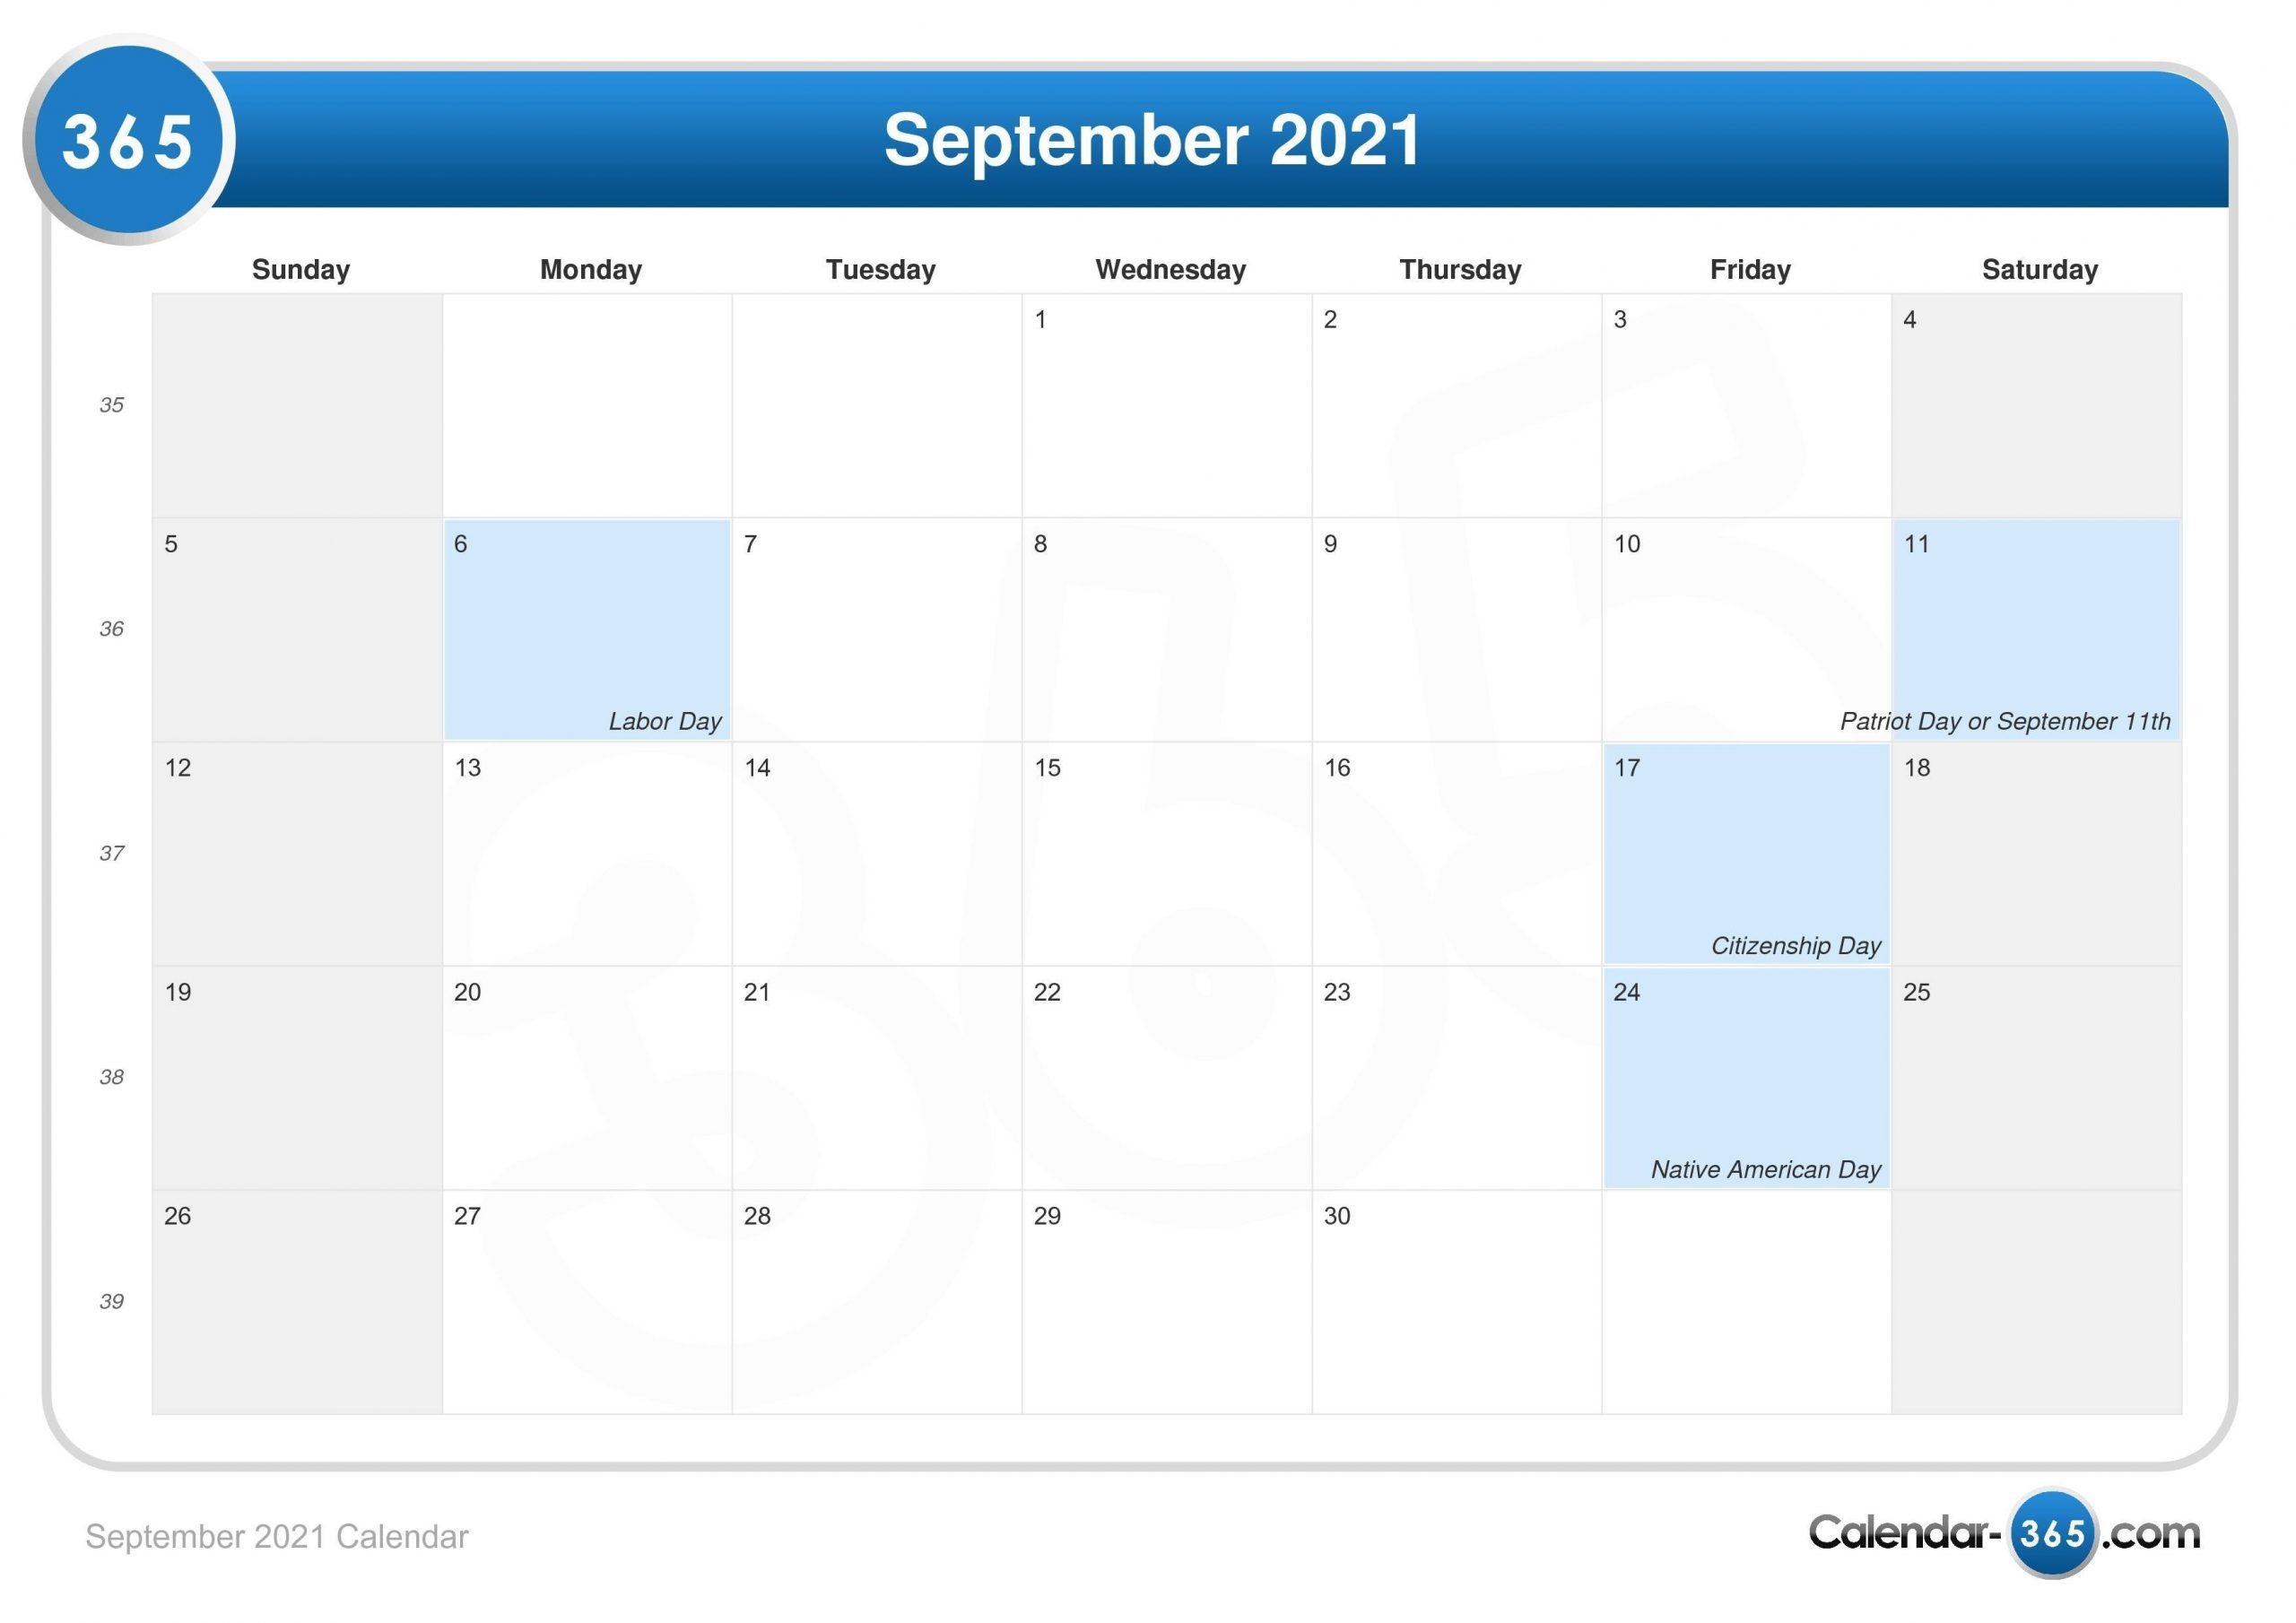 Catch 2021 Caender Sept